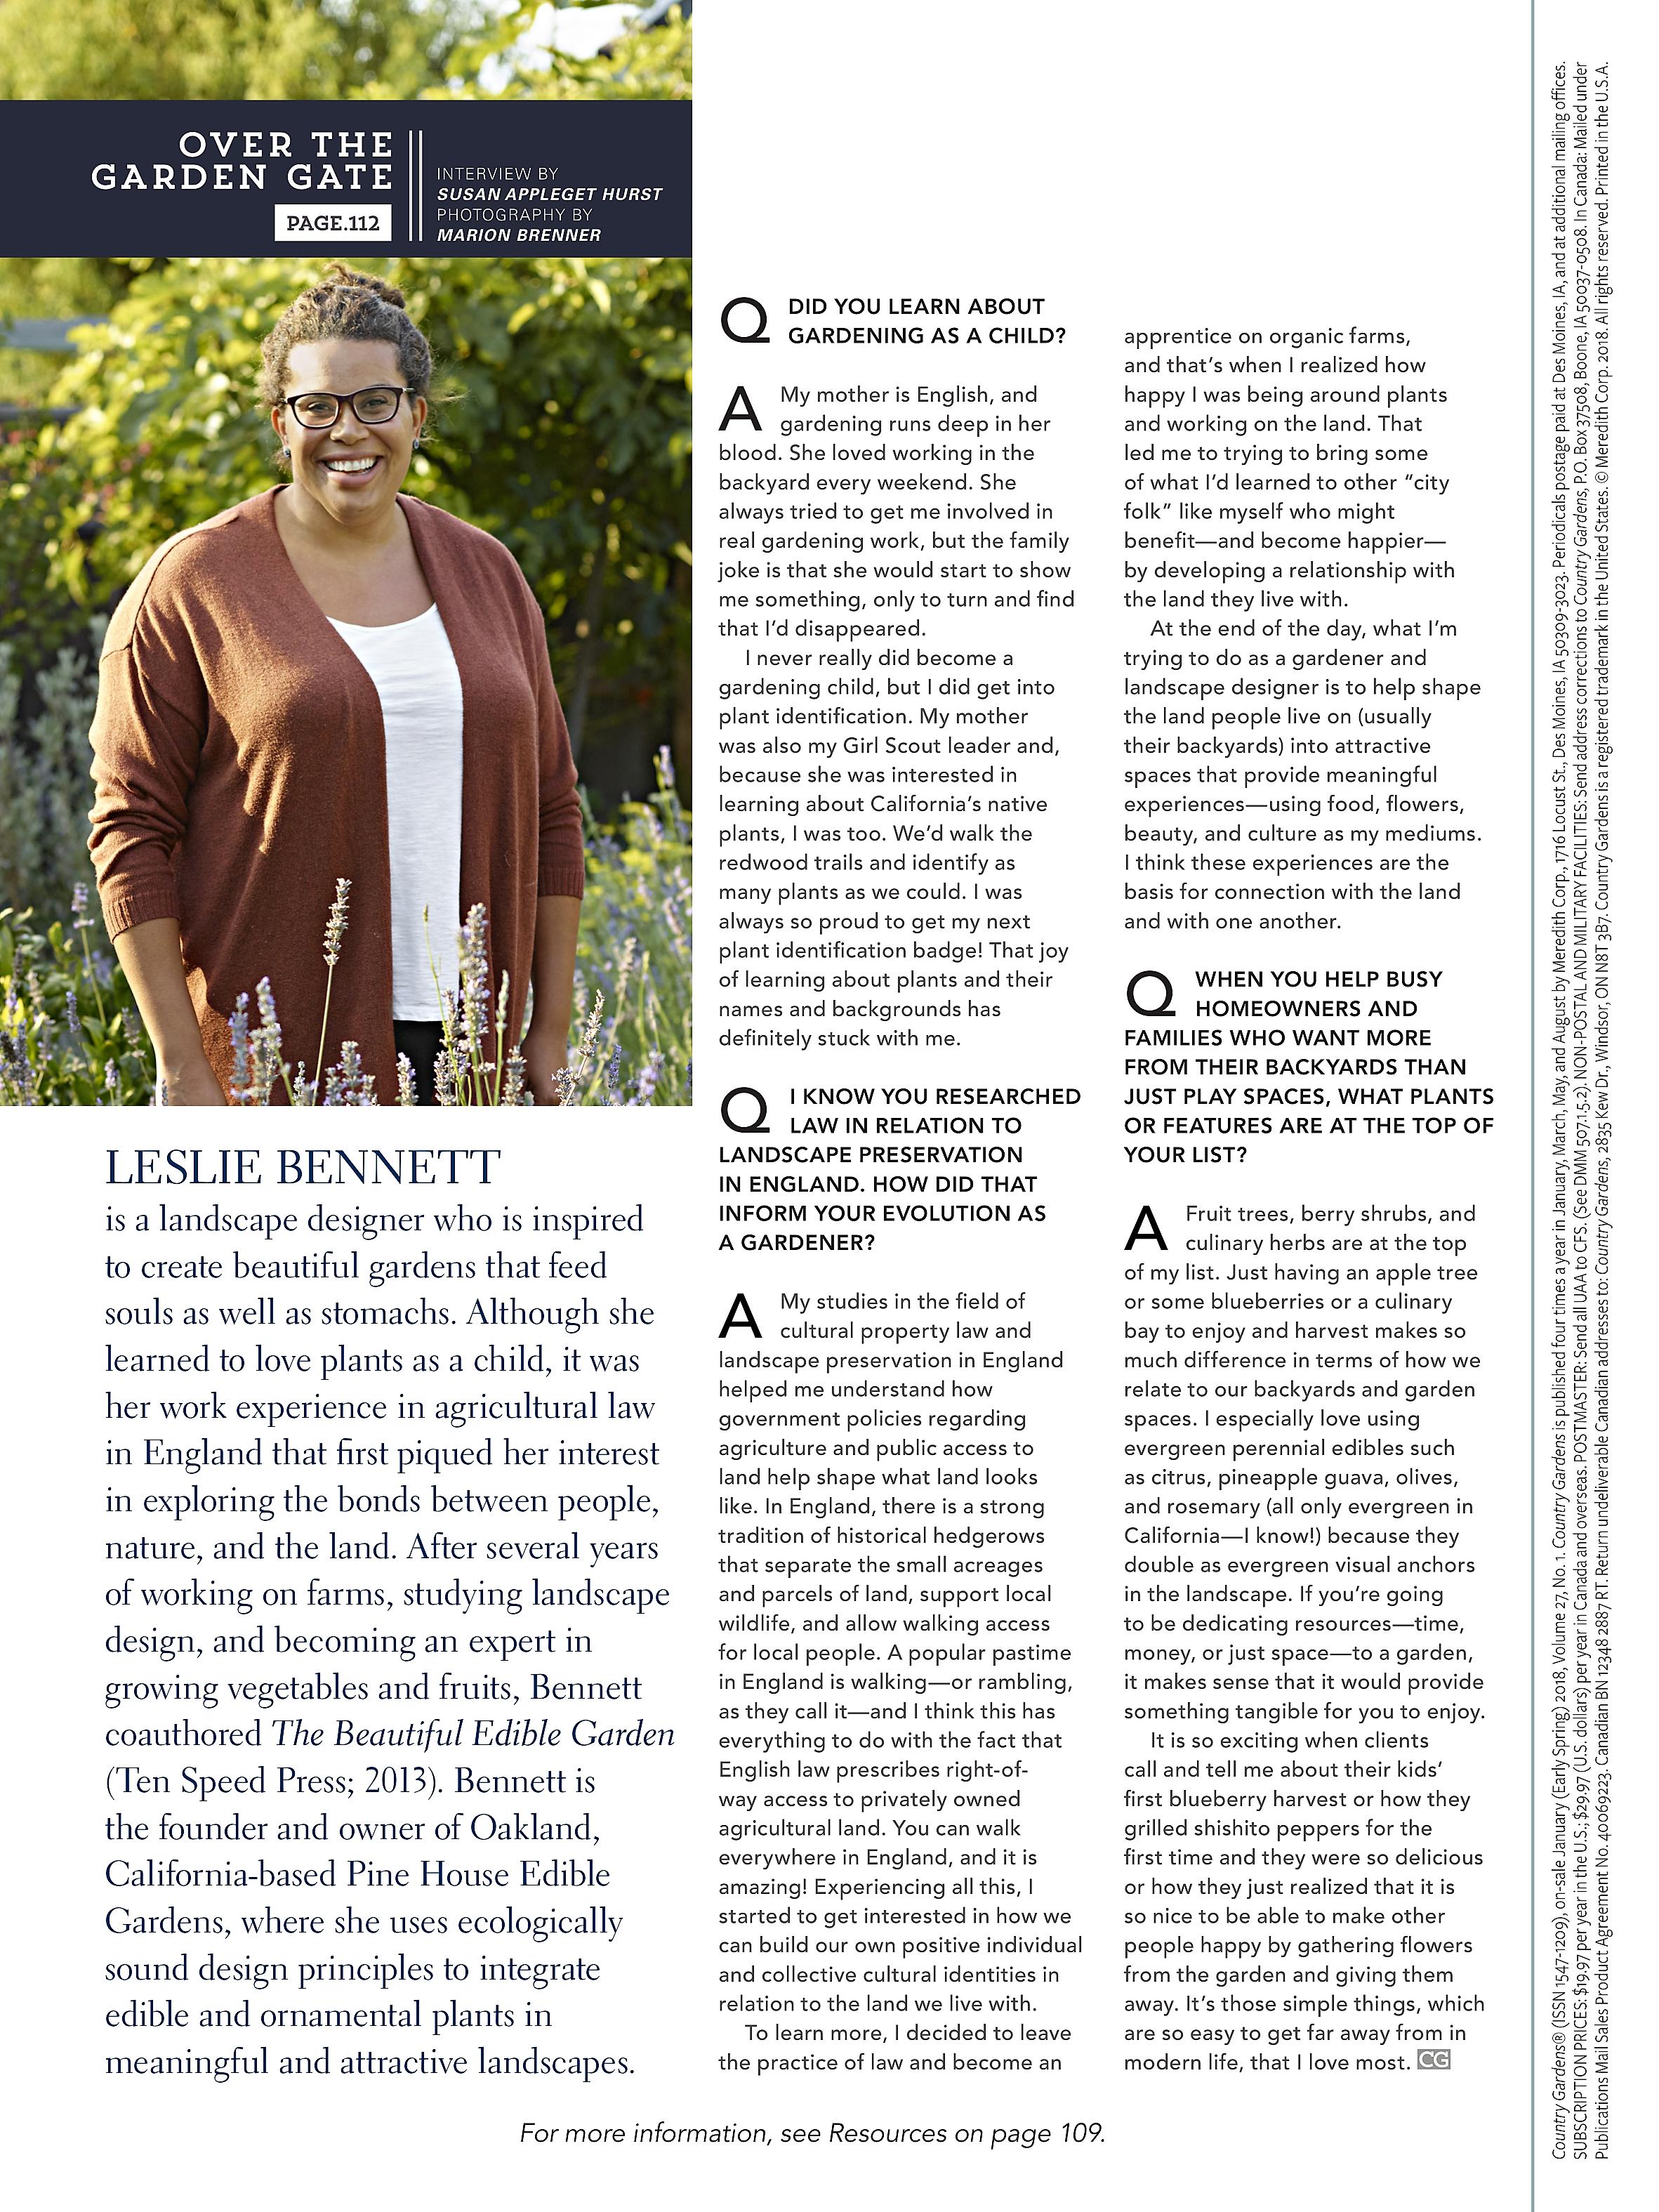 Country Gardens Interview Leslie Bennett.png